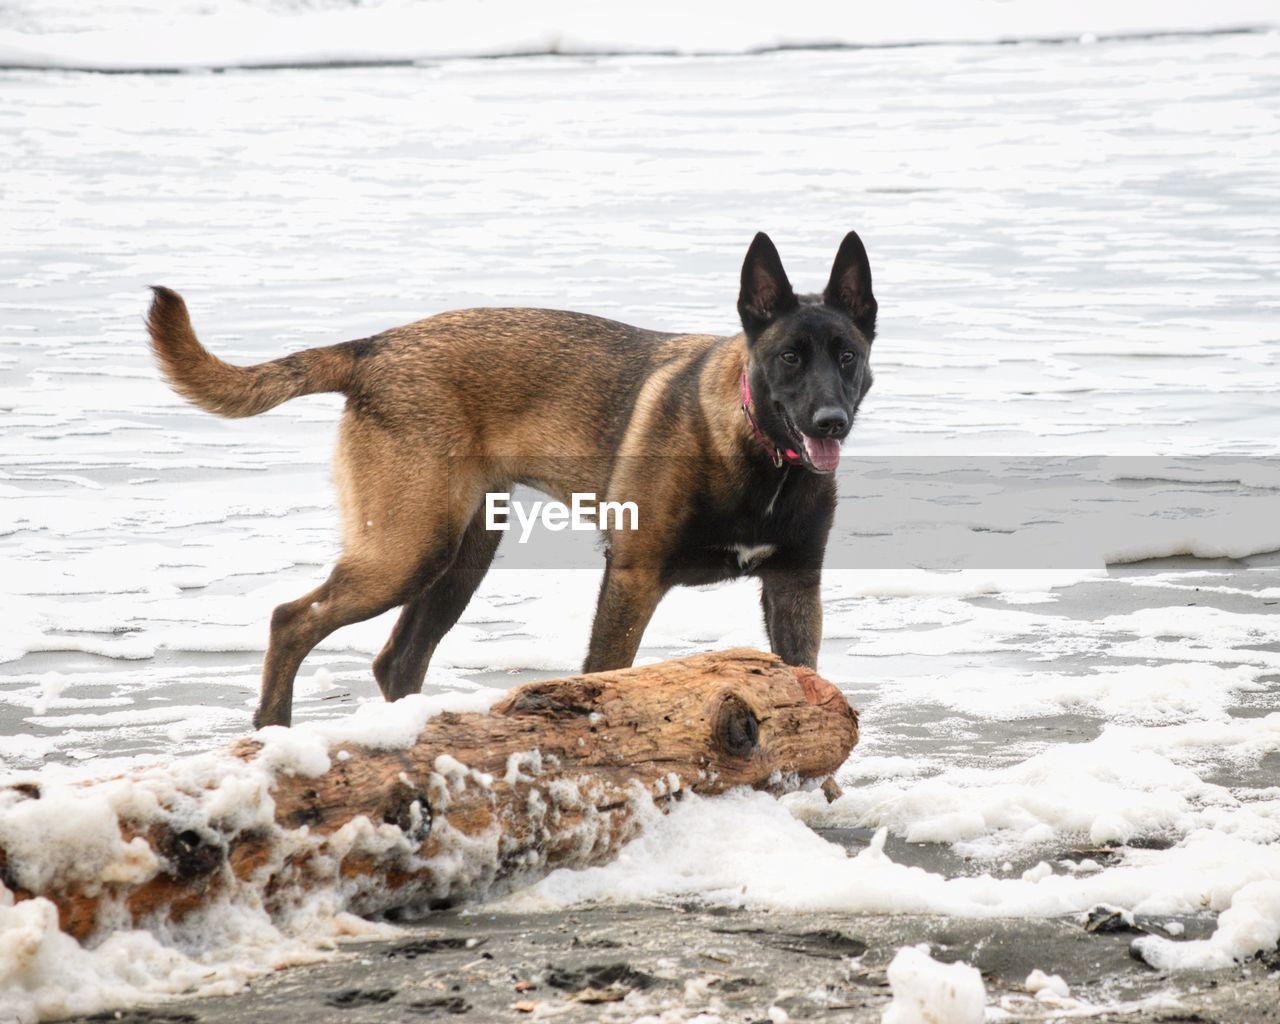 Dog on beach by sea